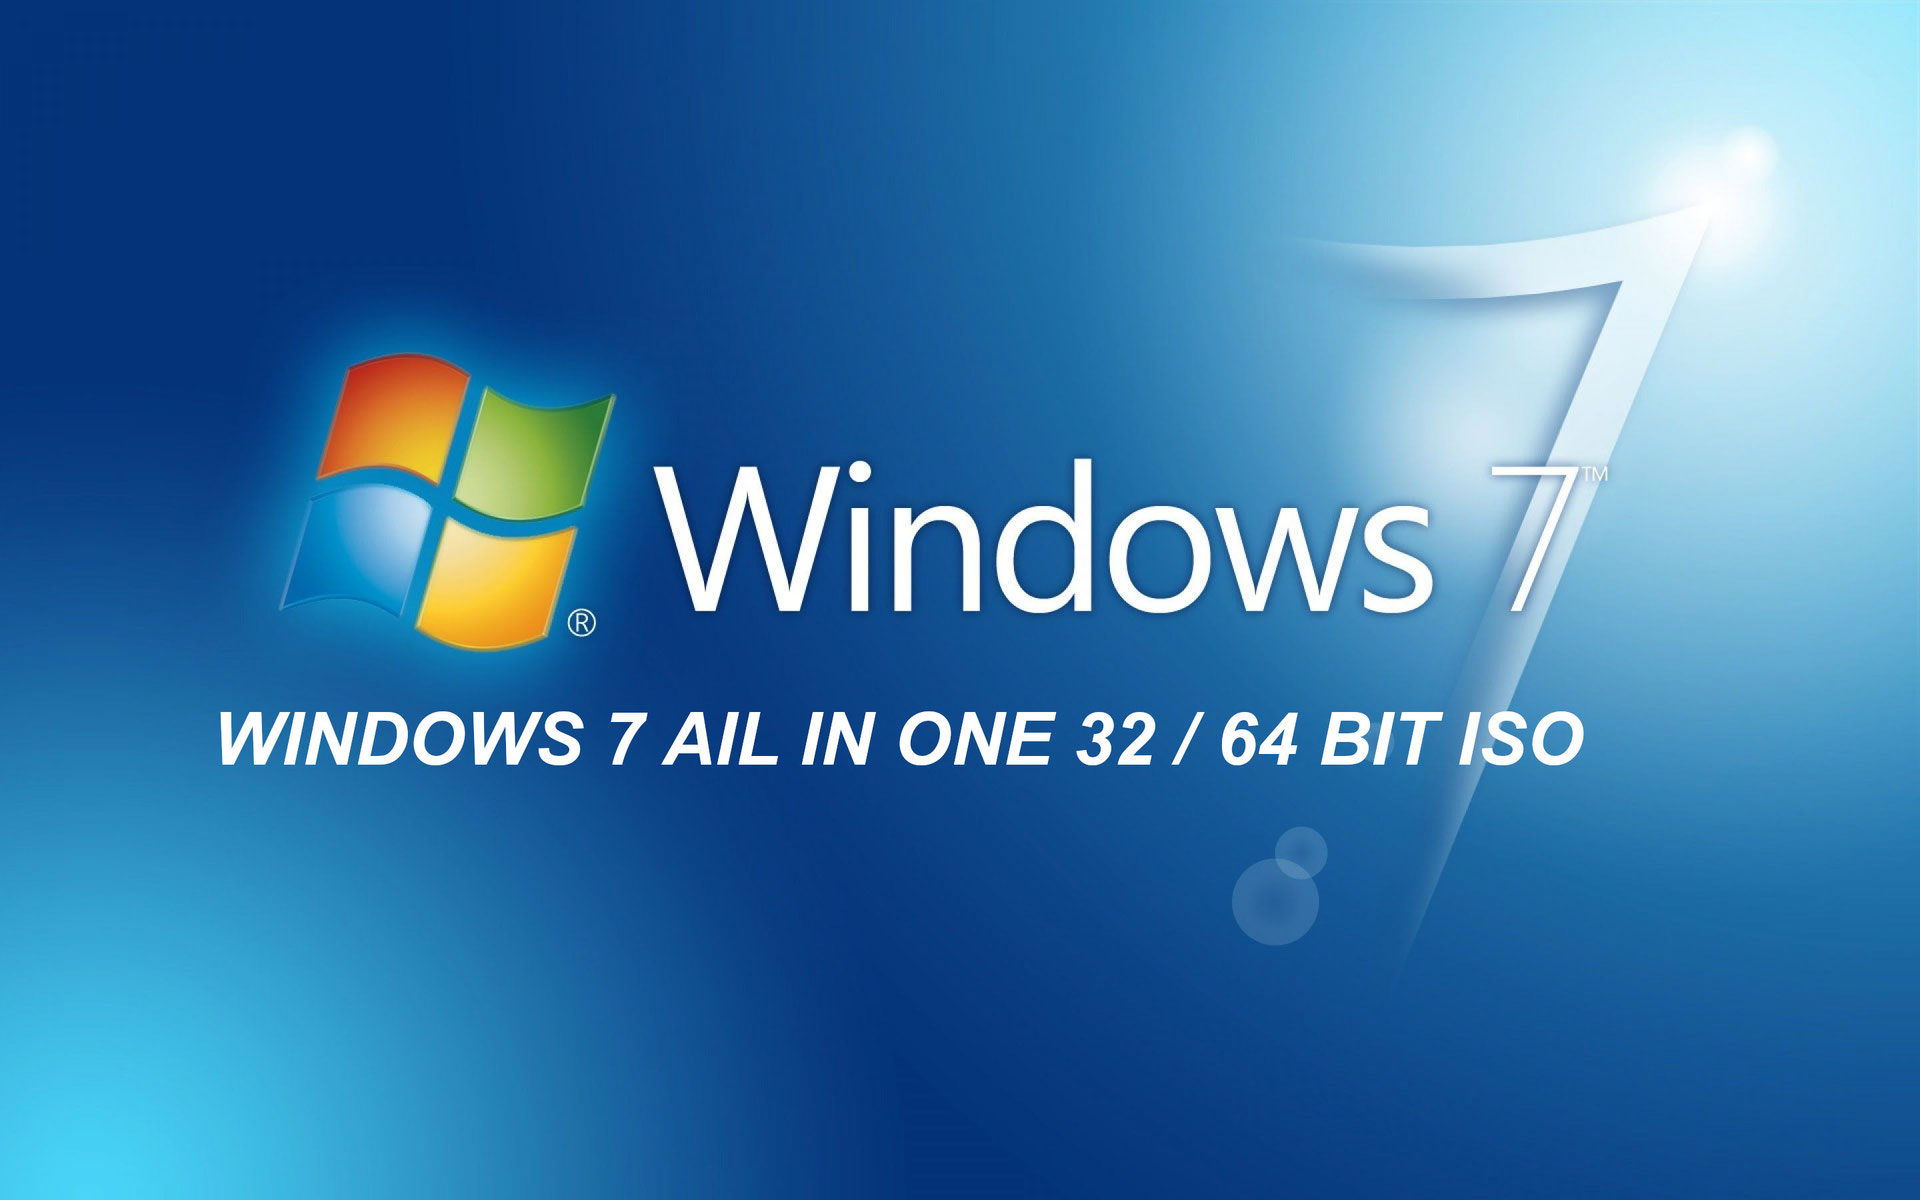 Windows 7 ALl in One 32 / 64 Bit ISO OEM RTM Version